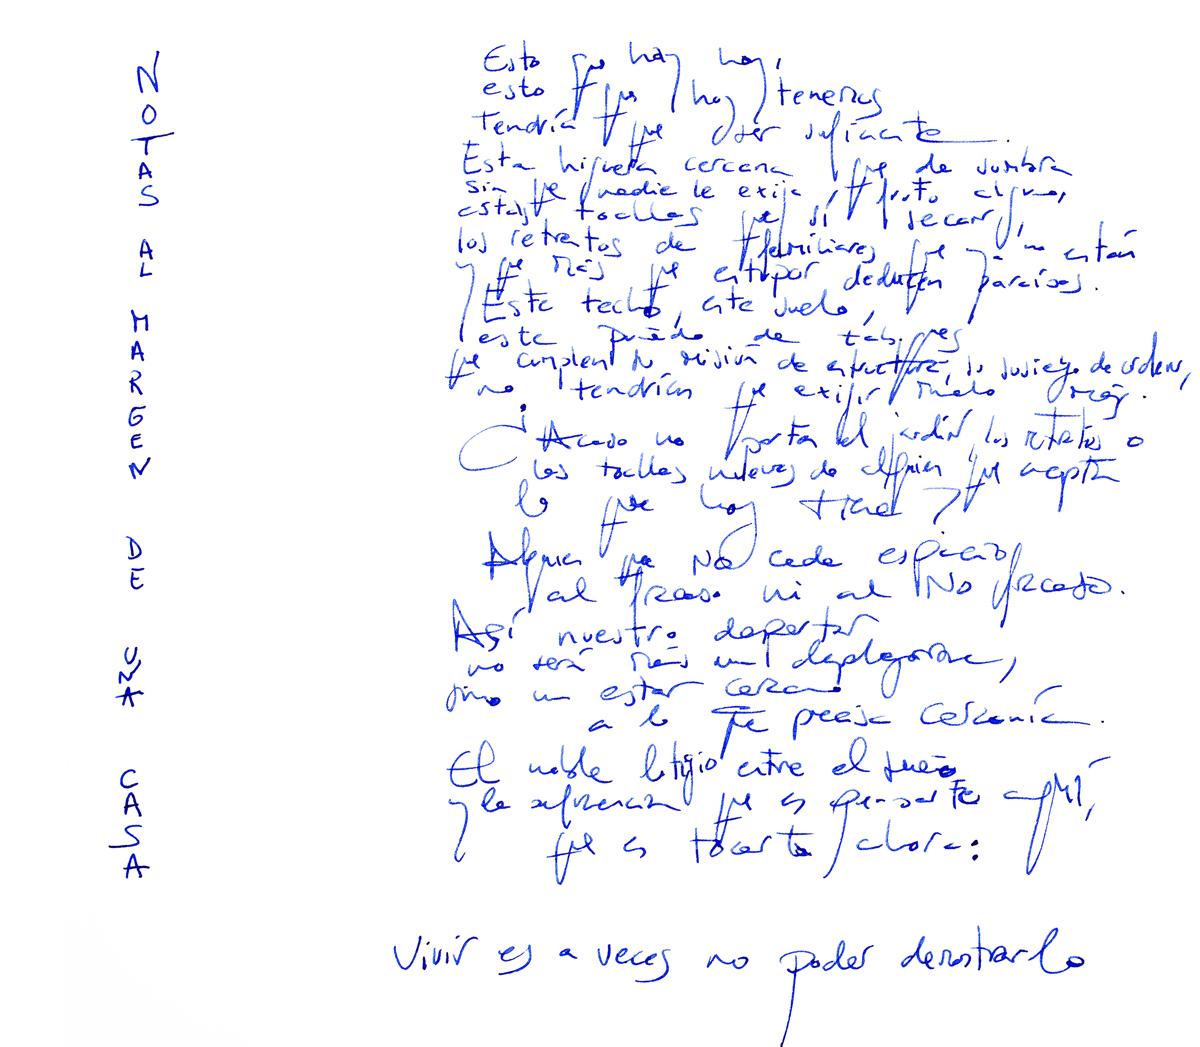 Alejandro Simón Partal - Como dos gotas de poesía   - Como dos gotas de poesía, fotografías de LaraBisbe